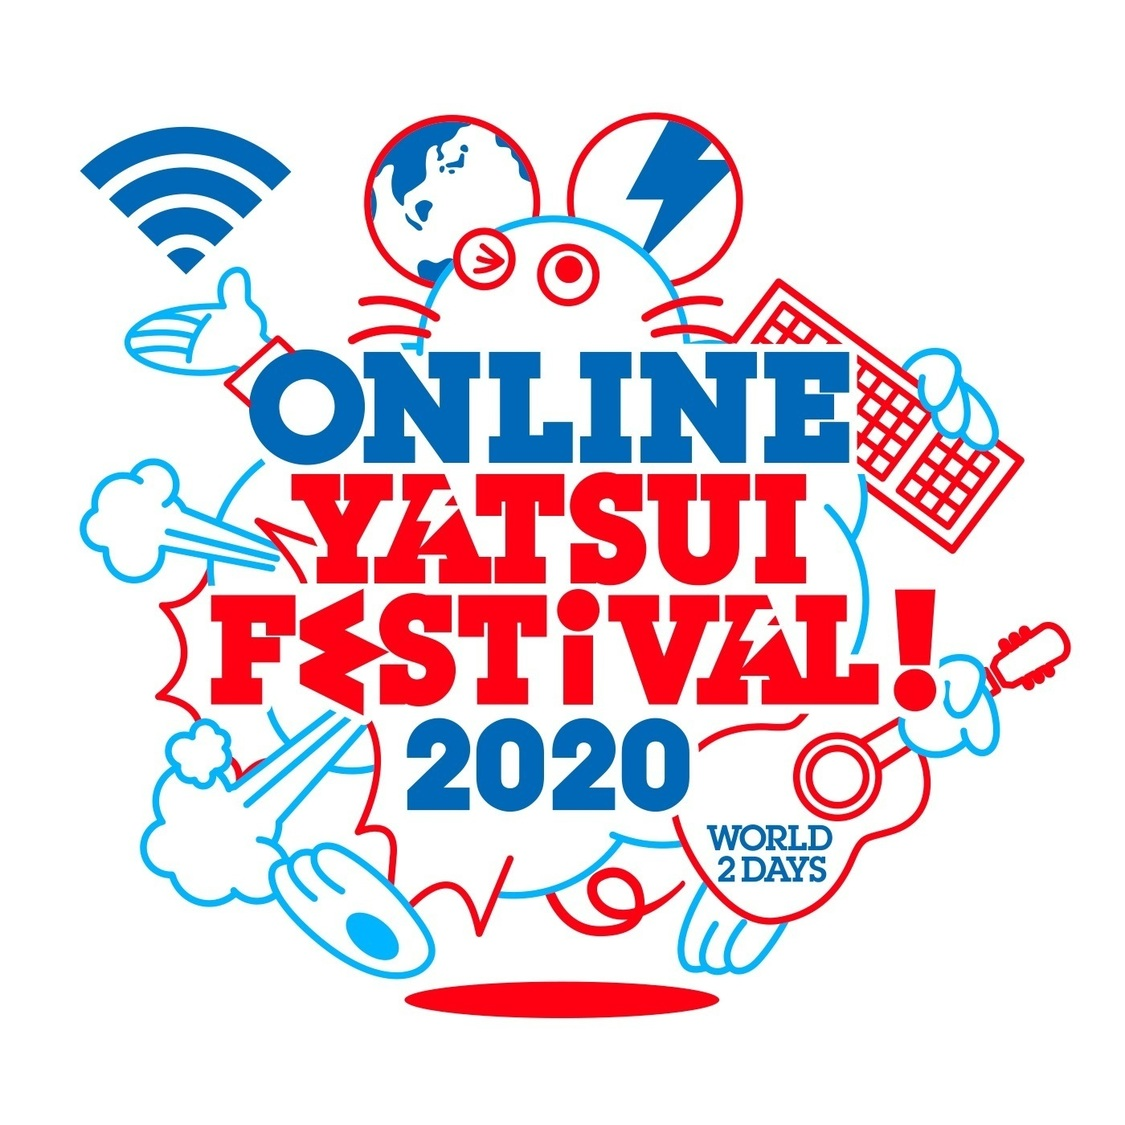 <ONLINE YATSUI FESTIVAL! 2020>、第3弾アーティストにエビ中、虹コン、まねきケチャ、吉川友、prediaら51組決定!